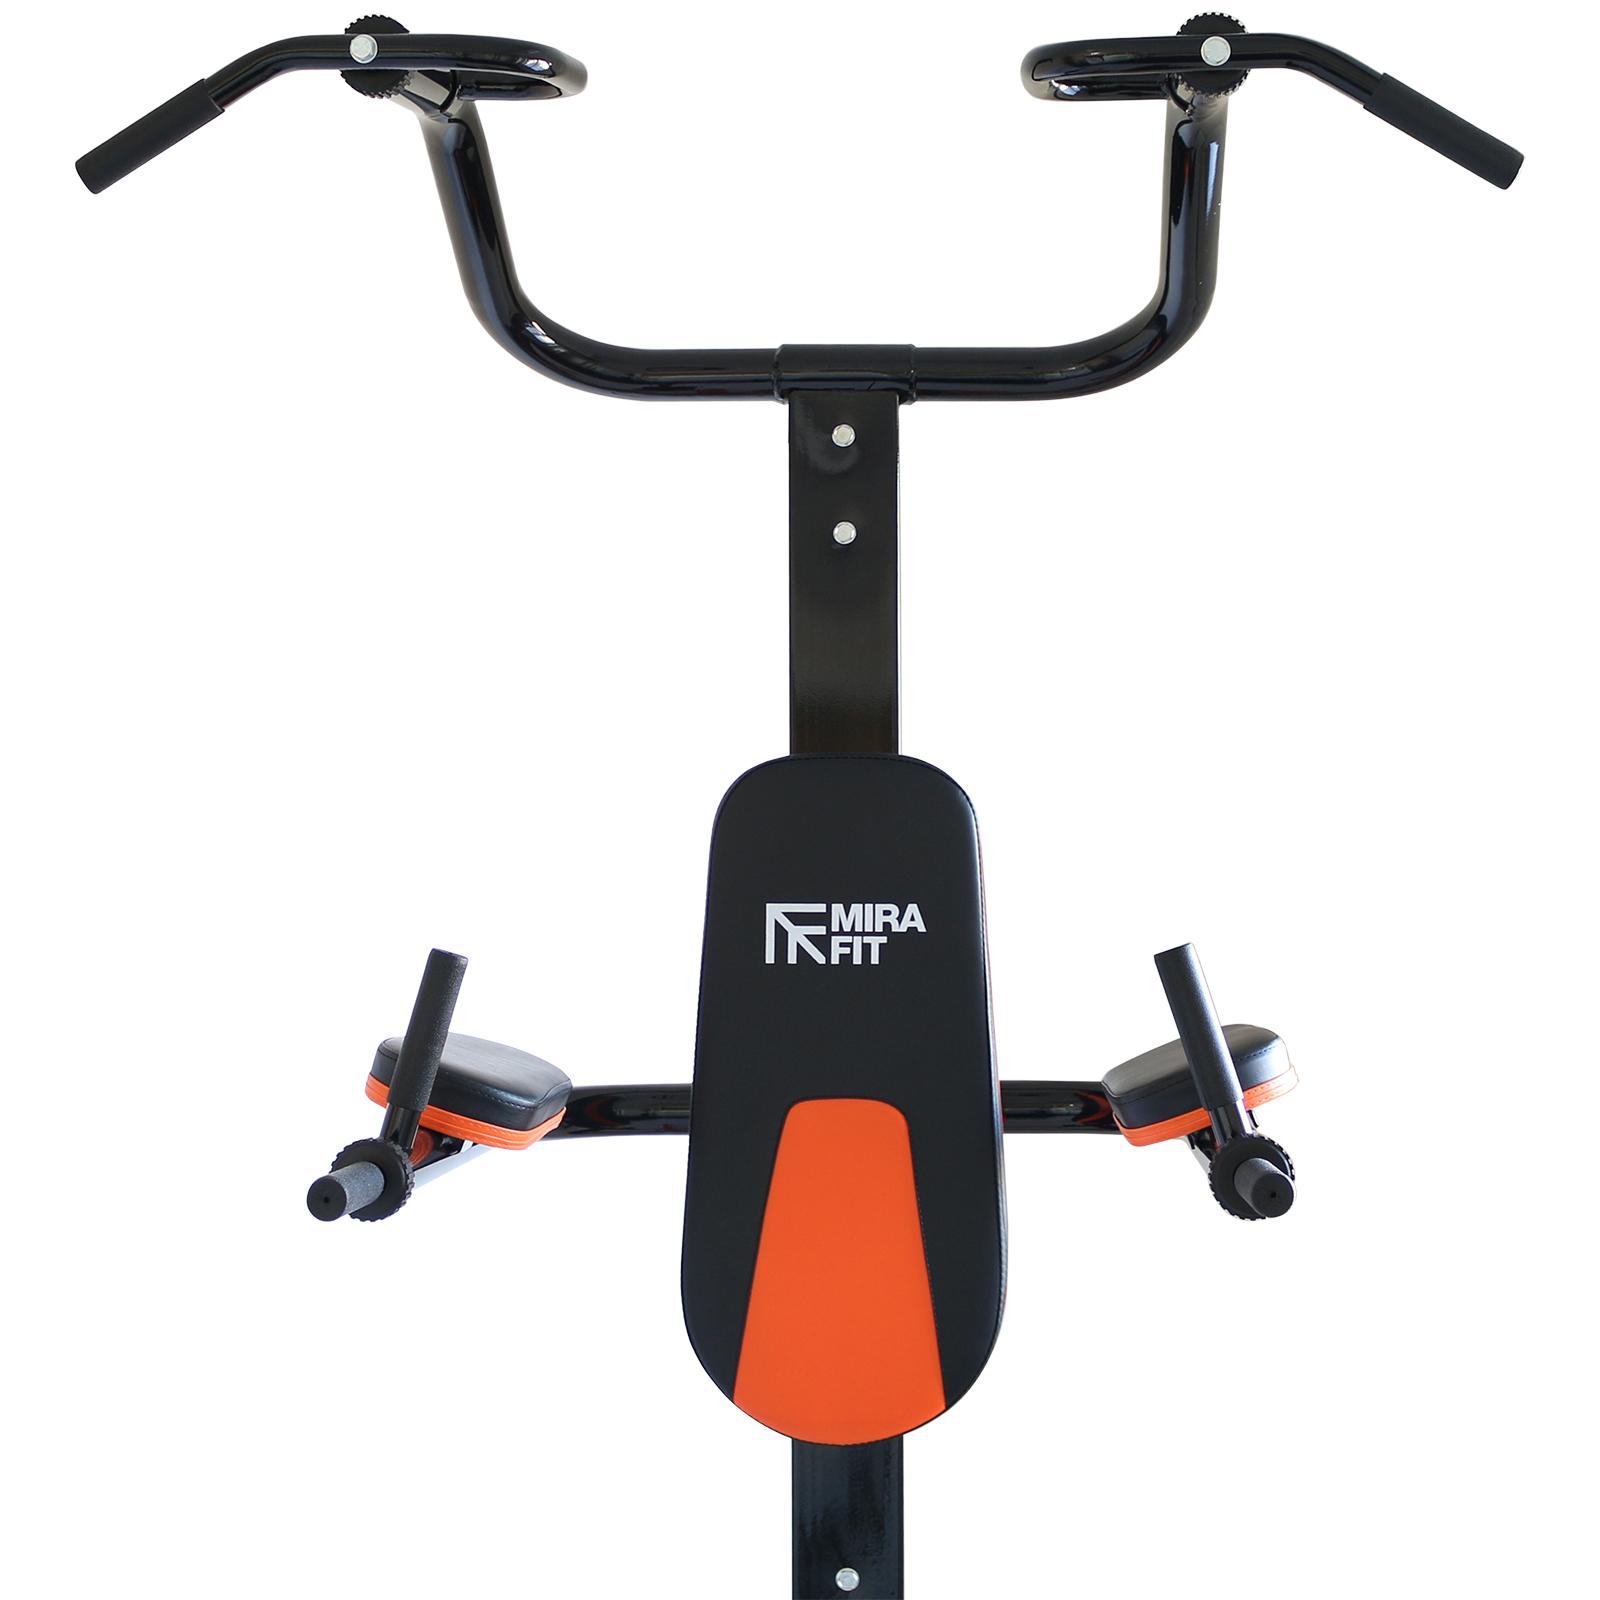 mirafit gym power tower push sit pull up bar vkr dip multi. Black Bedroom Furniture Sets. Home Design Ideas